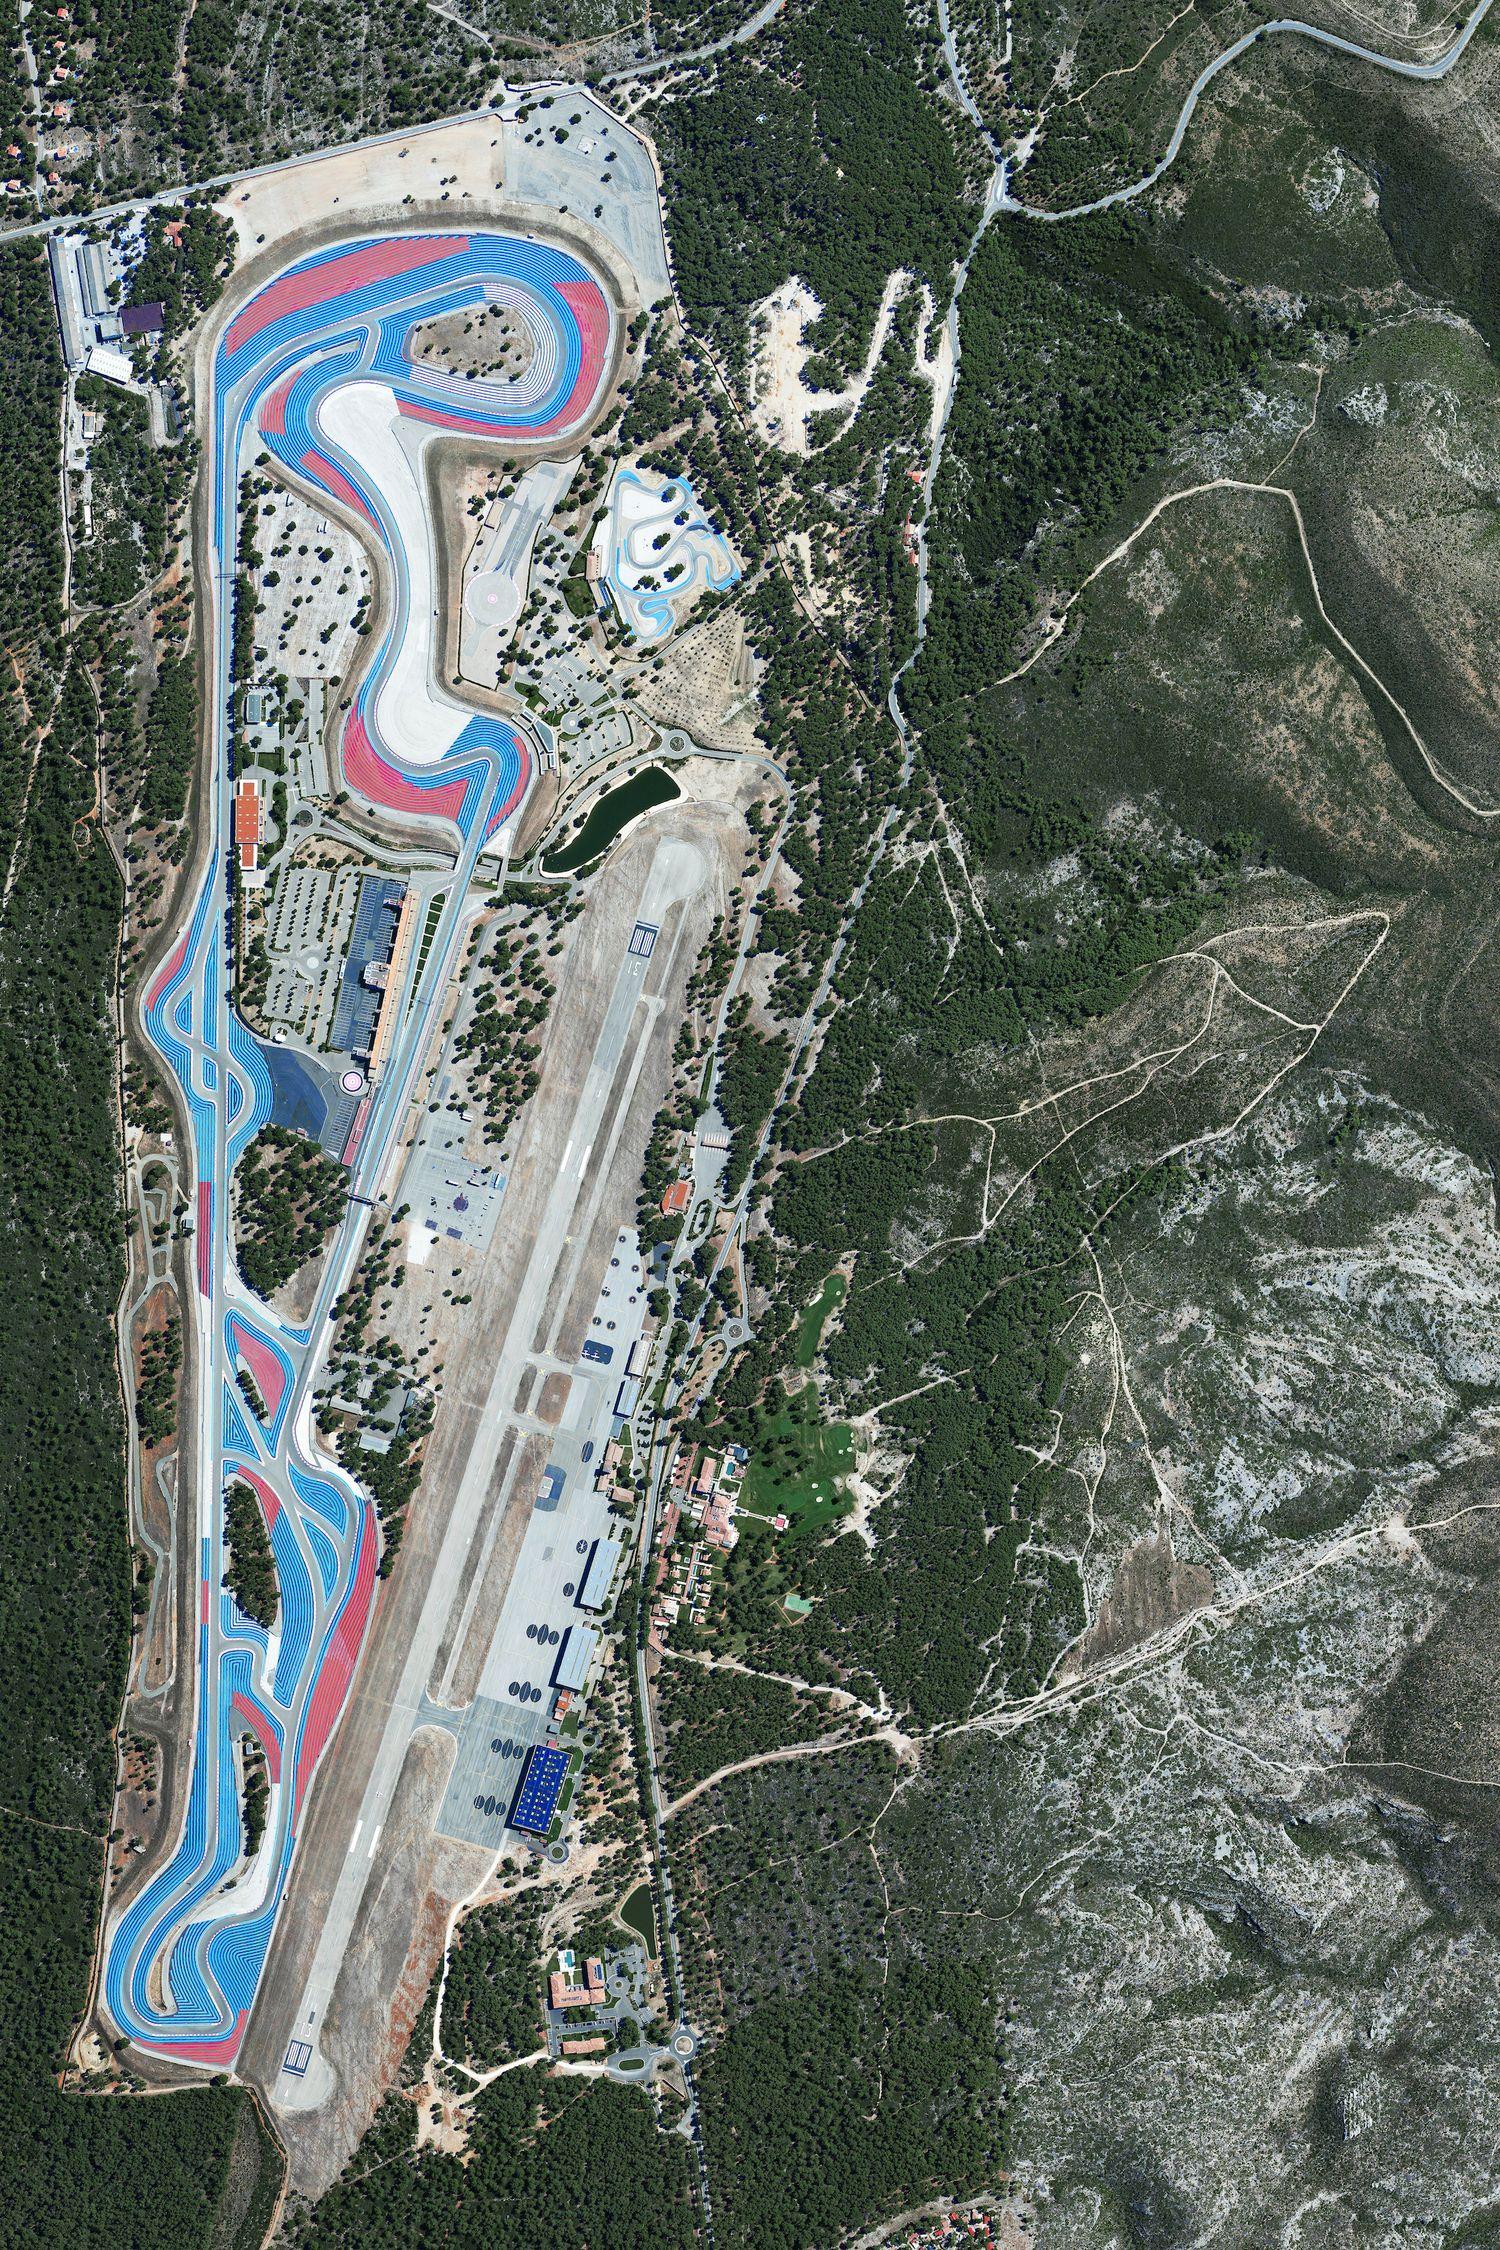 12 6 2015 Circuit Paul Ricard Le Castellet France 43 15 2 N 5 47